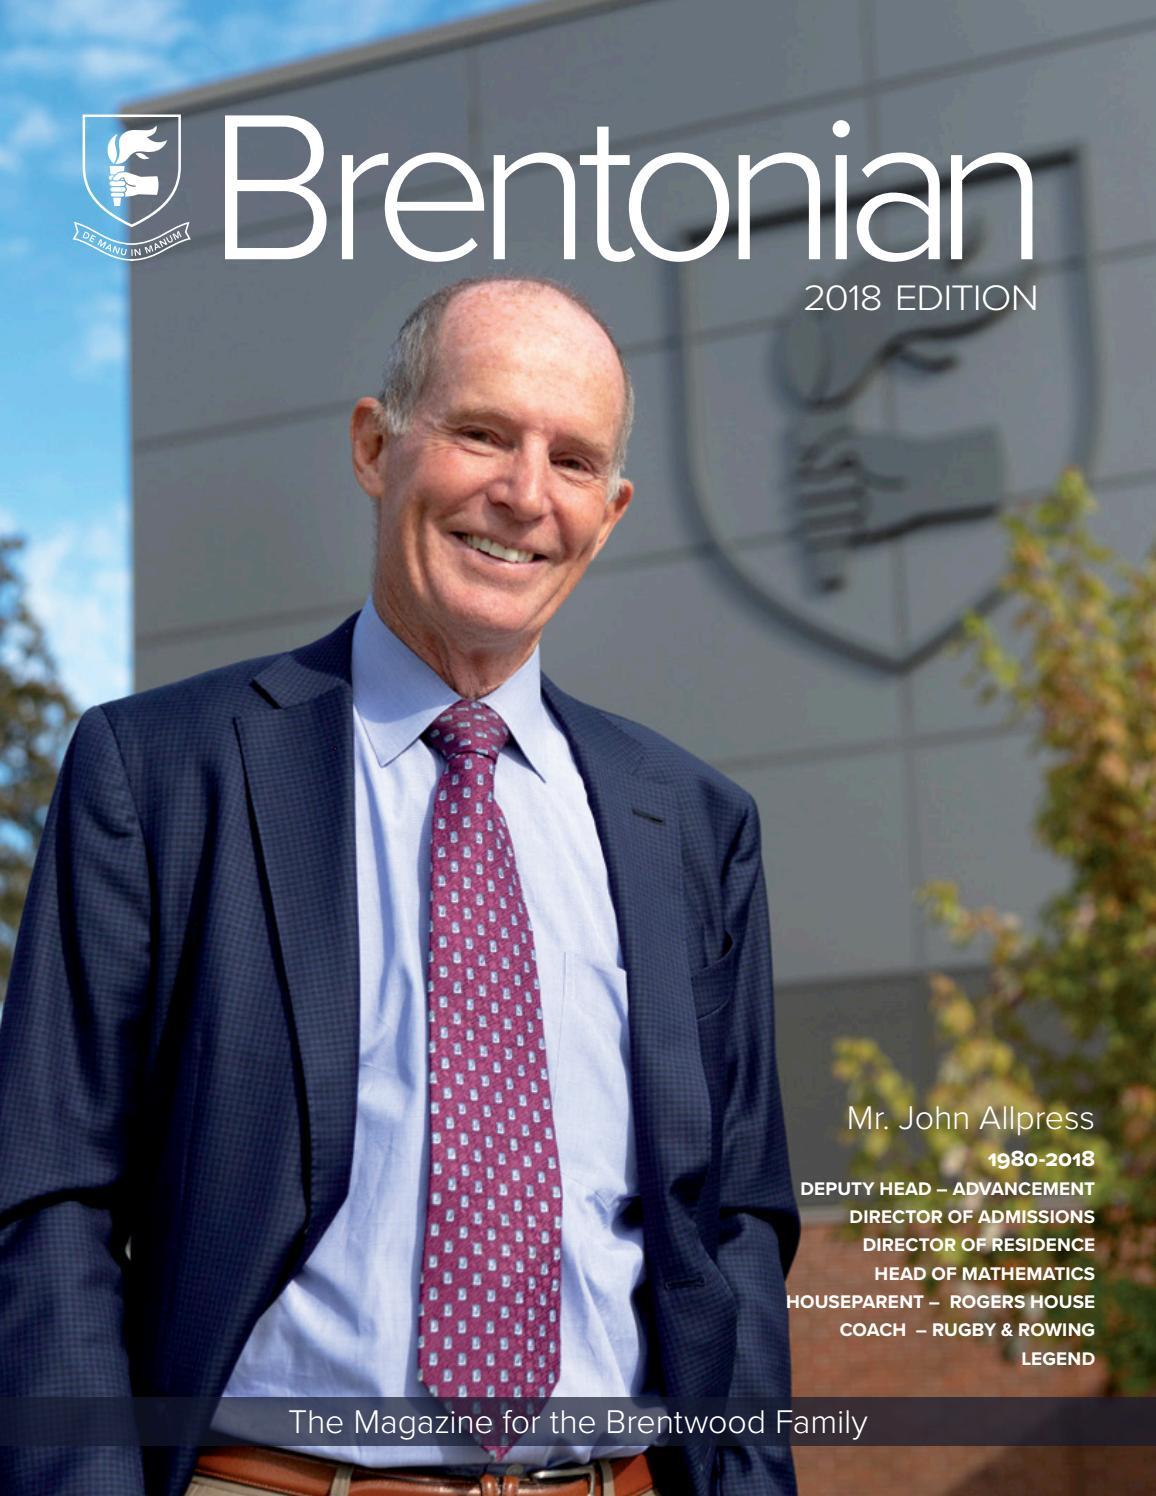 bc15ec75d28 Brentonian Magazine 2018 by Brentwood College School - issuu